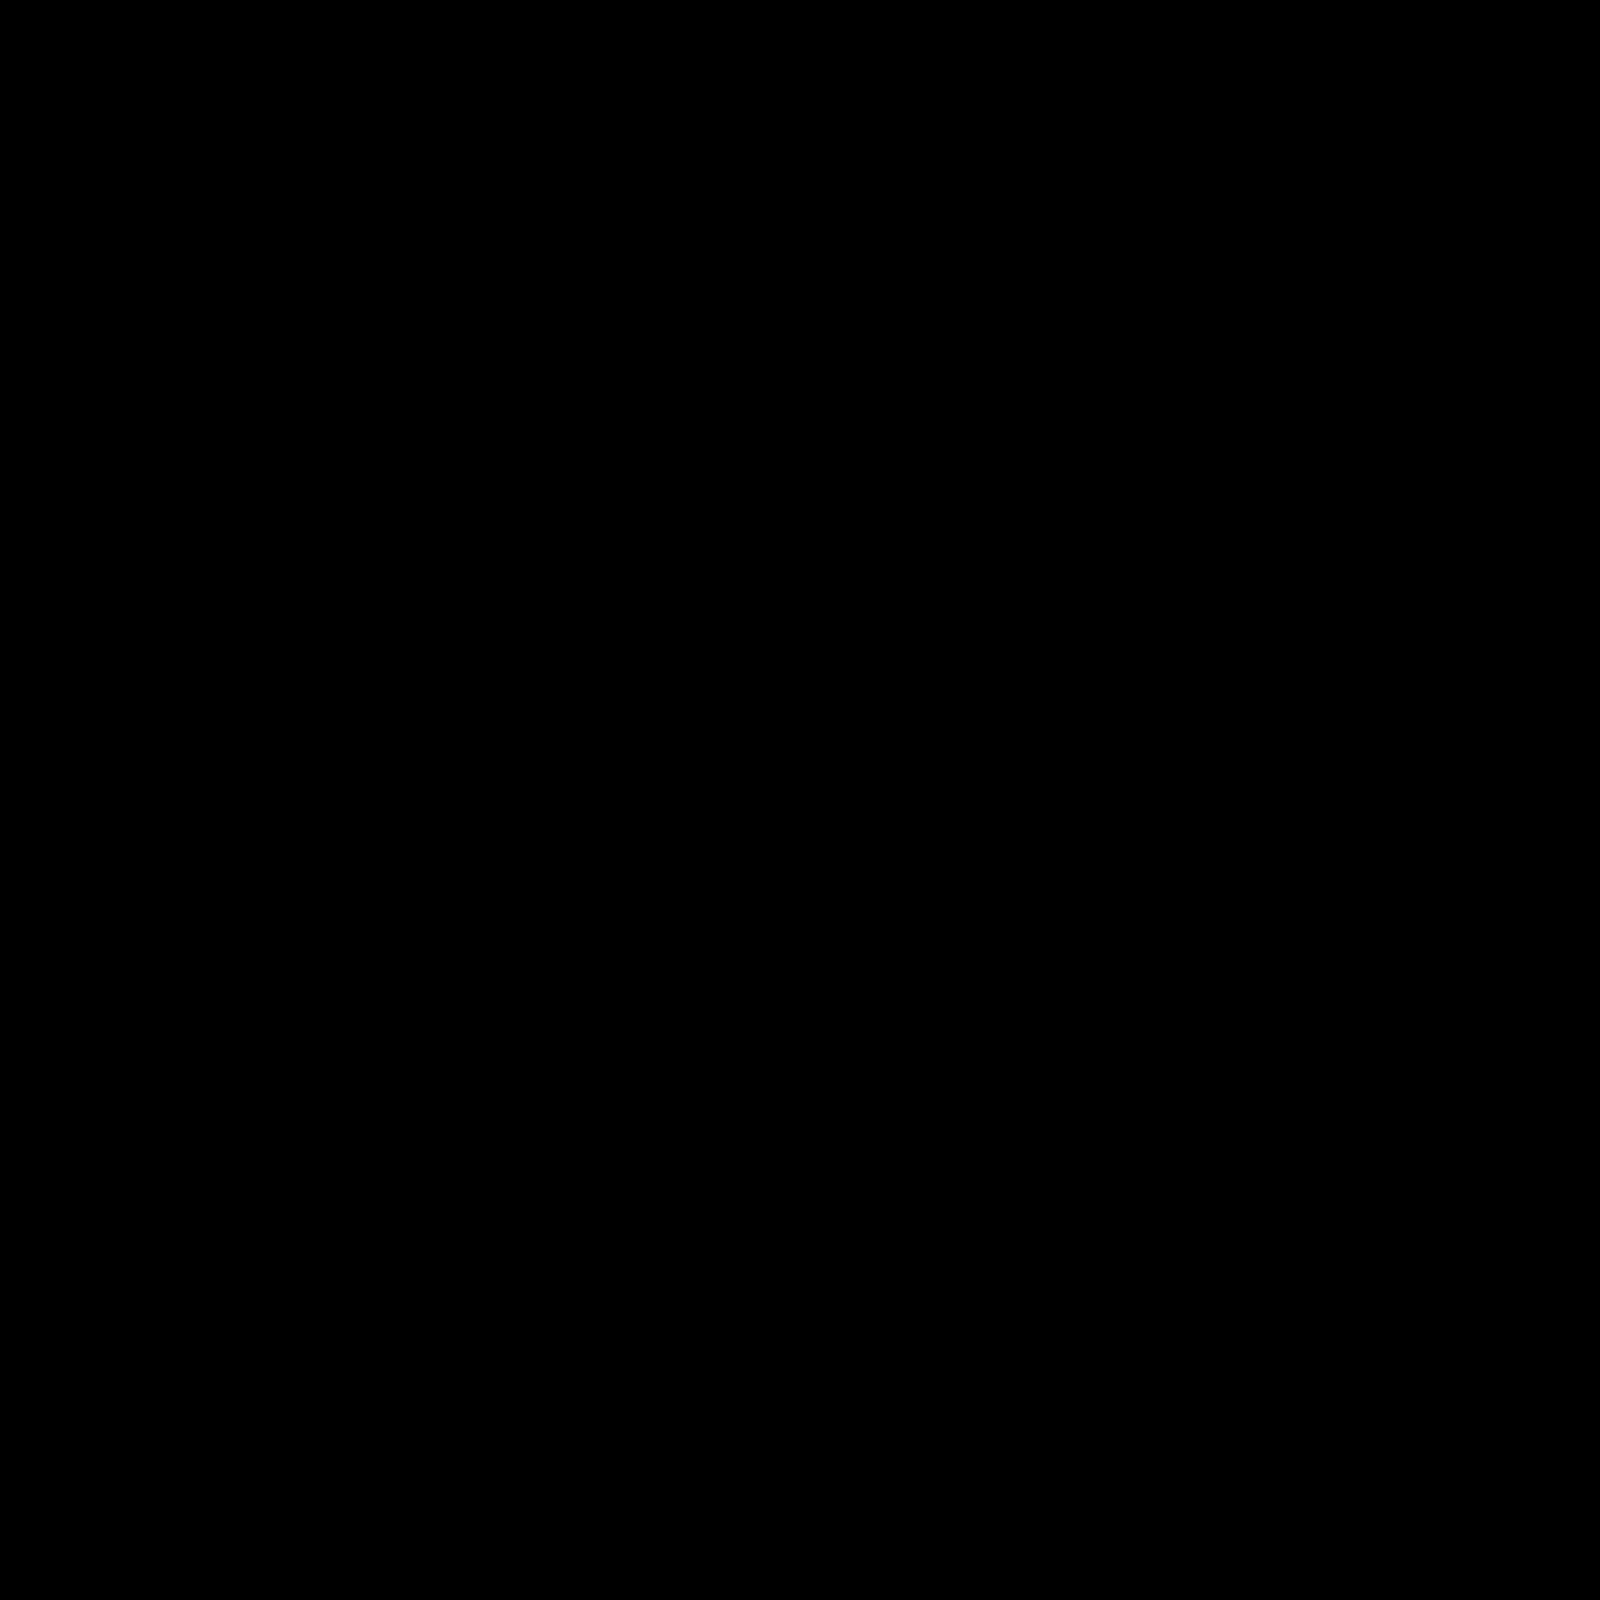 94 icon